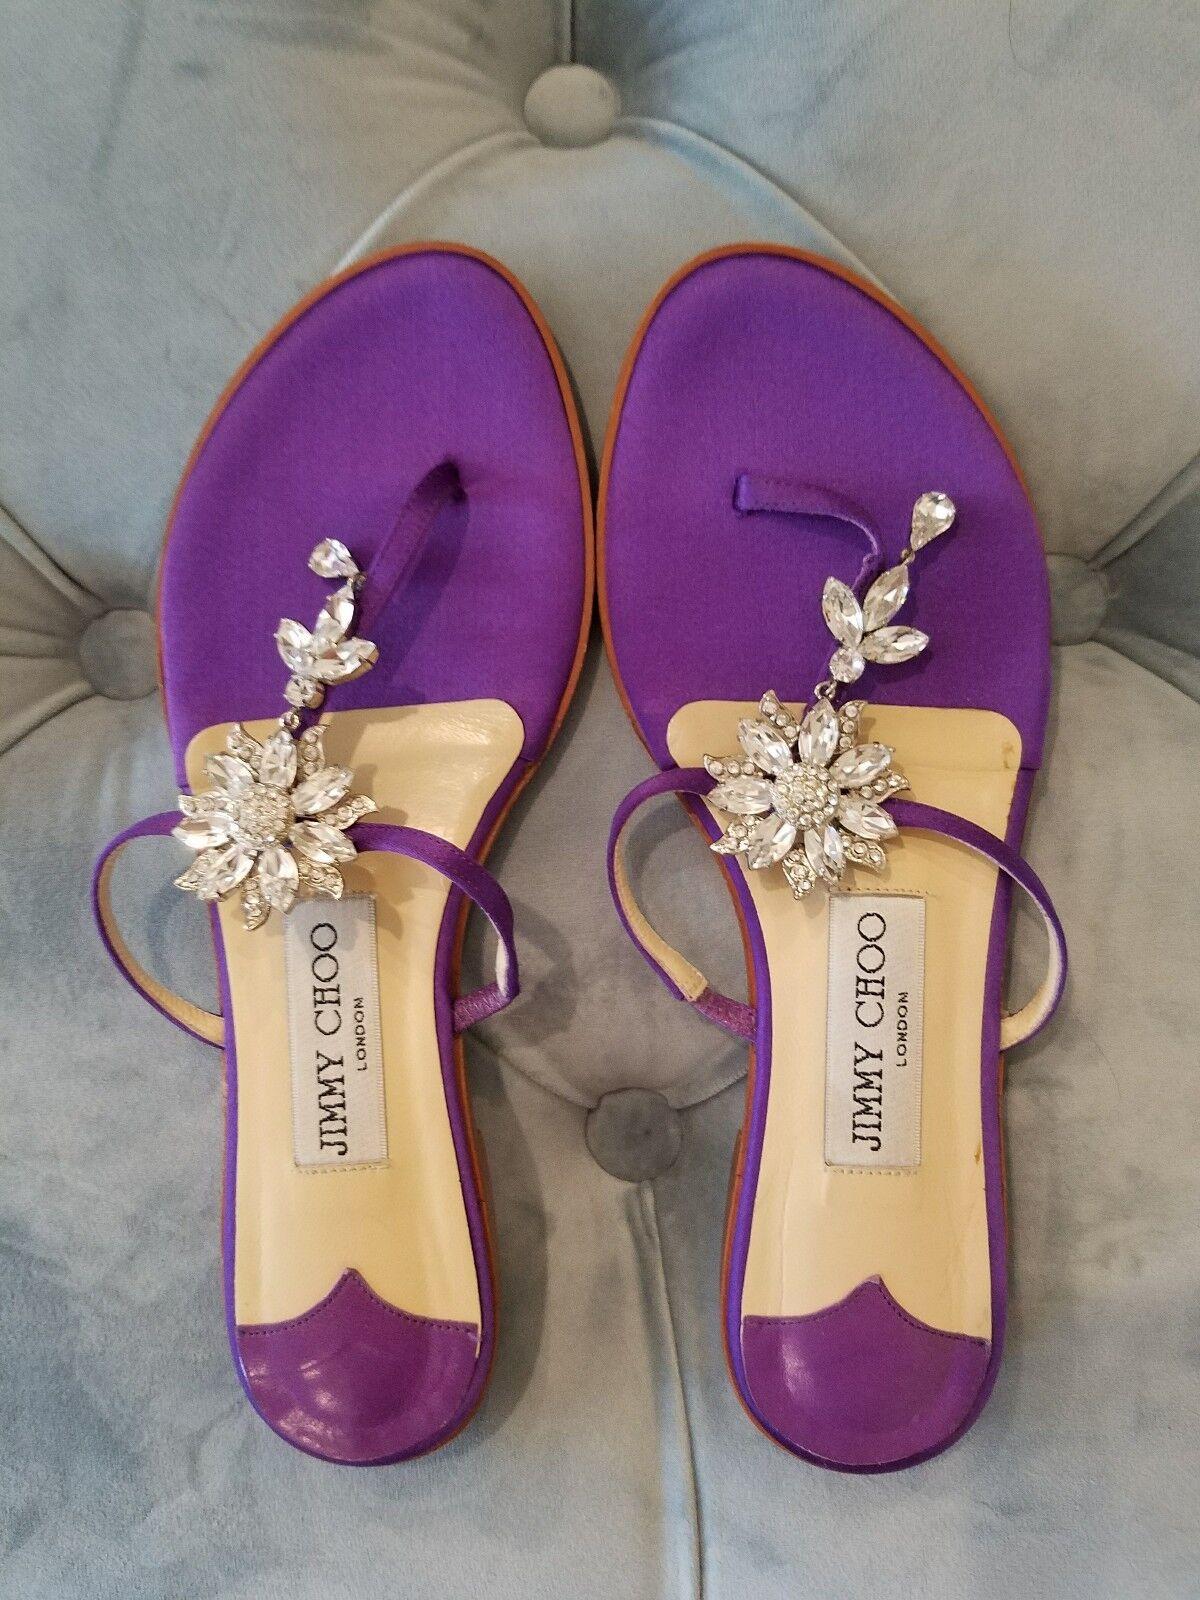 JIMMY CHOO purple crystal Rhinestones Sandler flats, retail $480